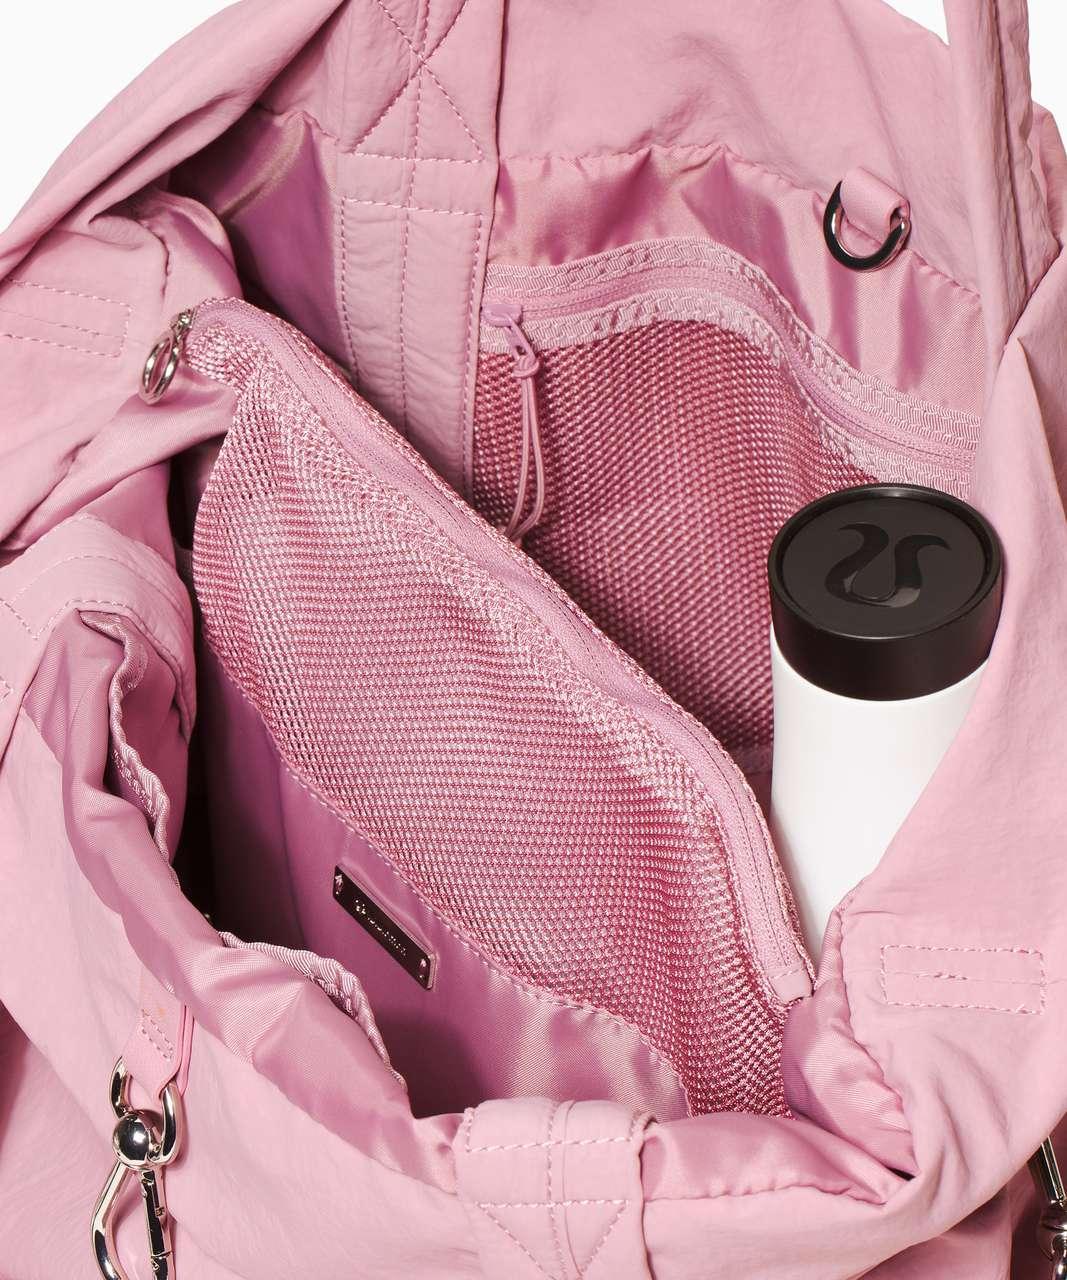 Lululemon On My Level Bag *Large 30L - Pink Taupe